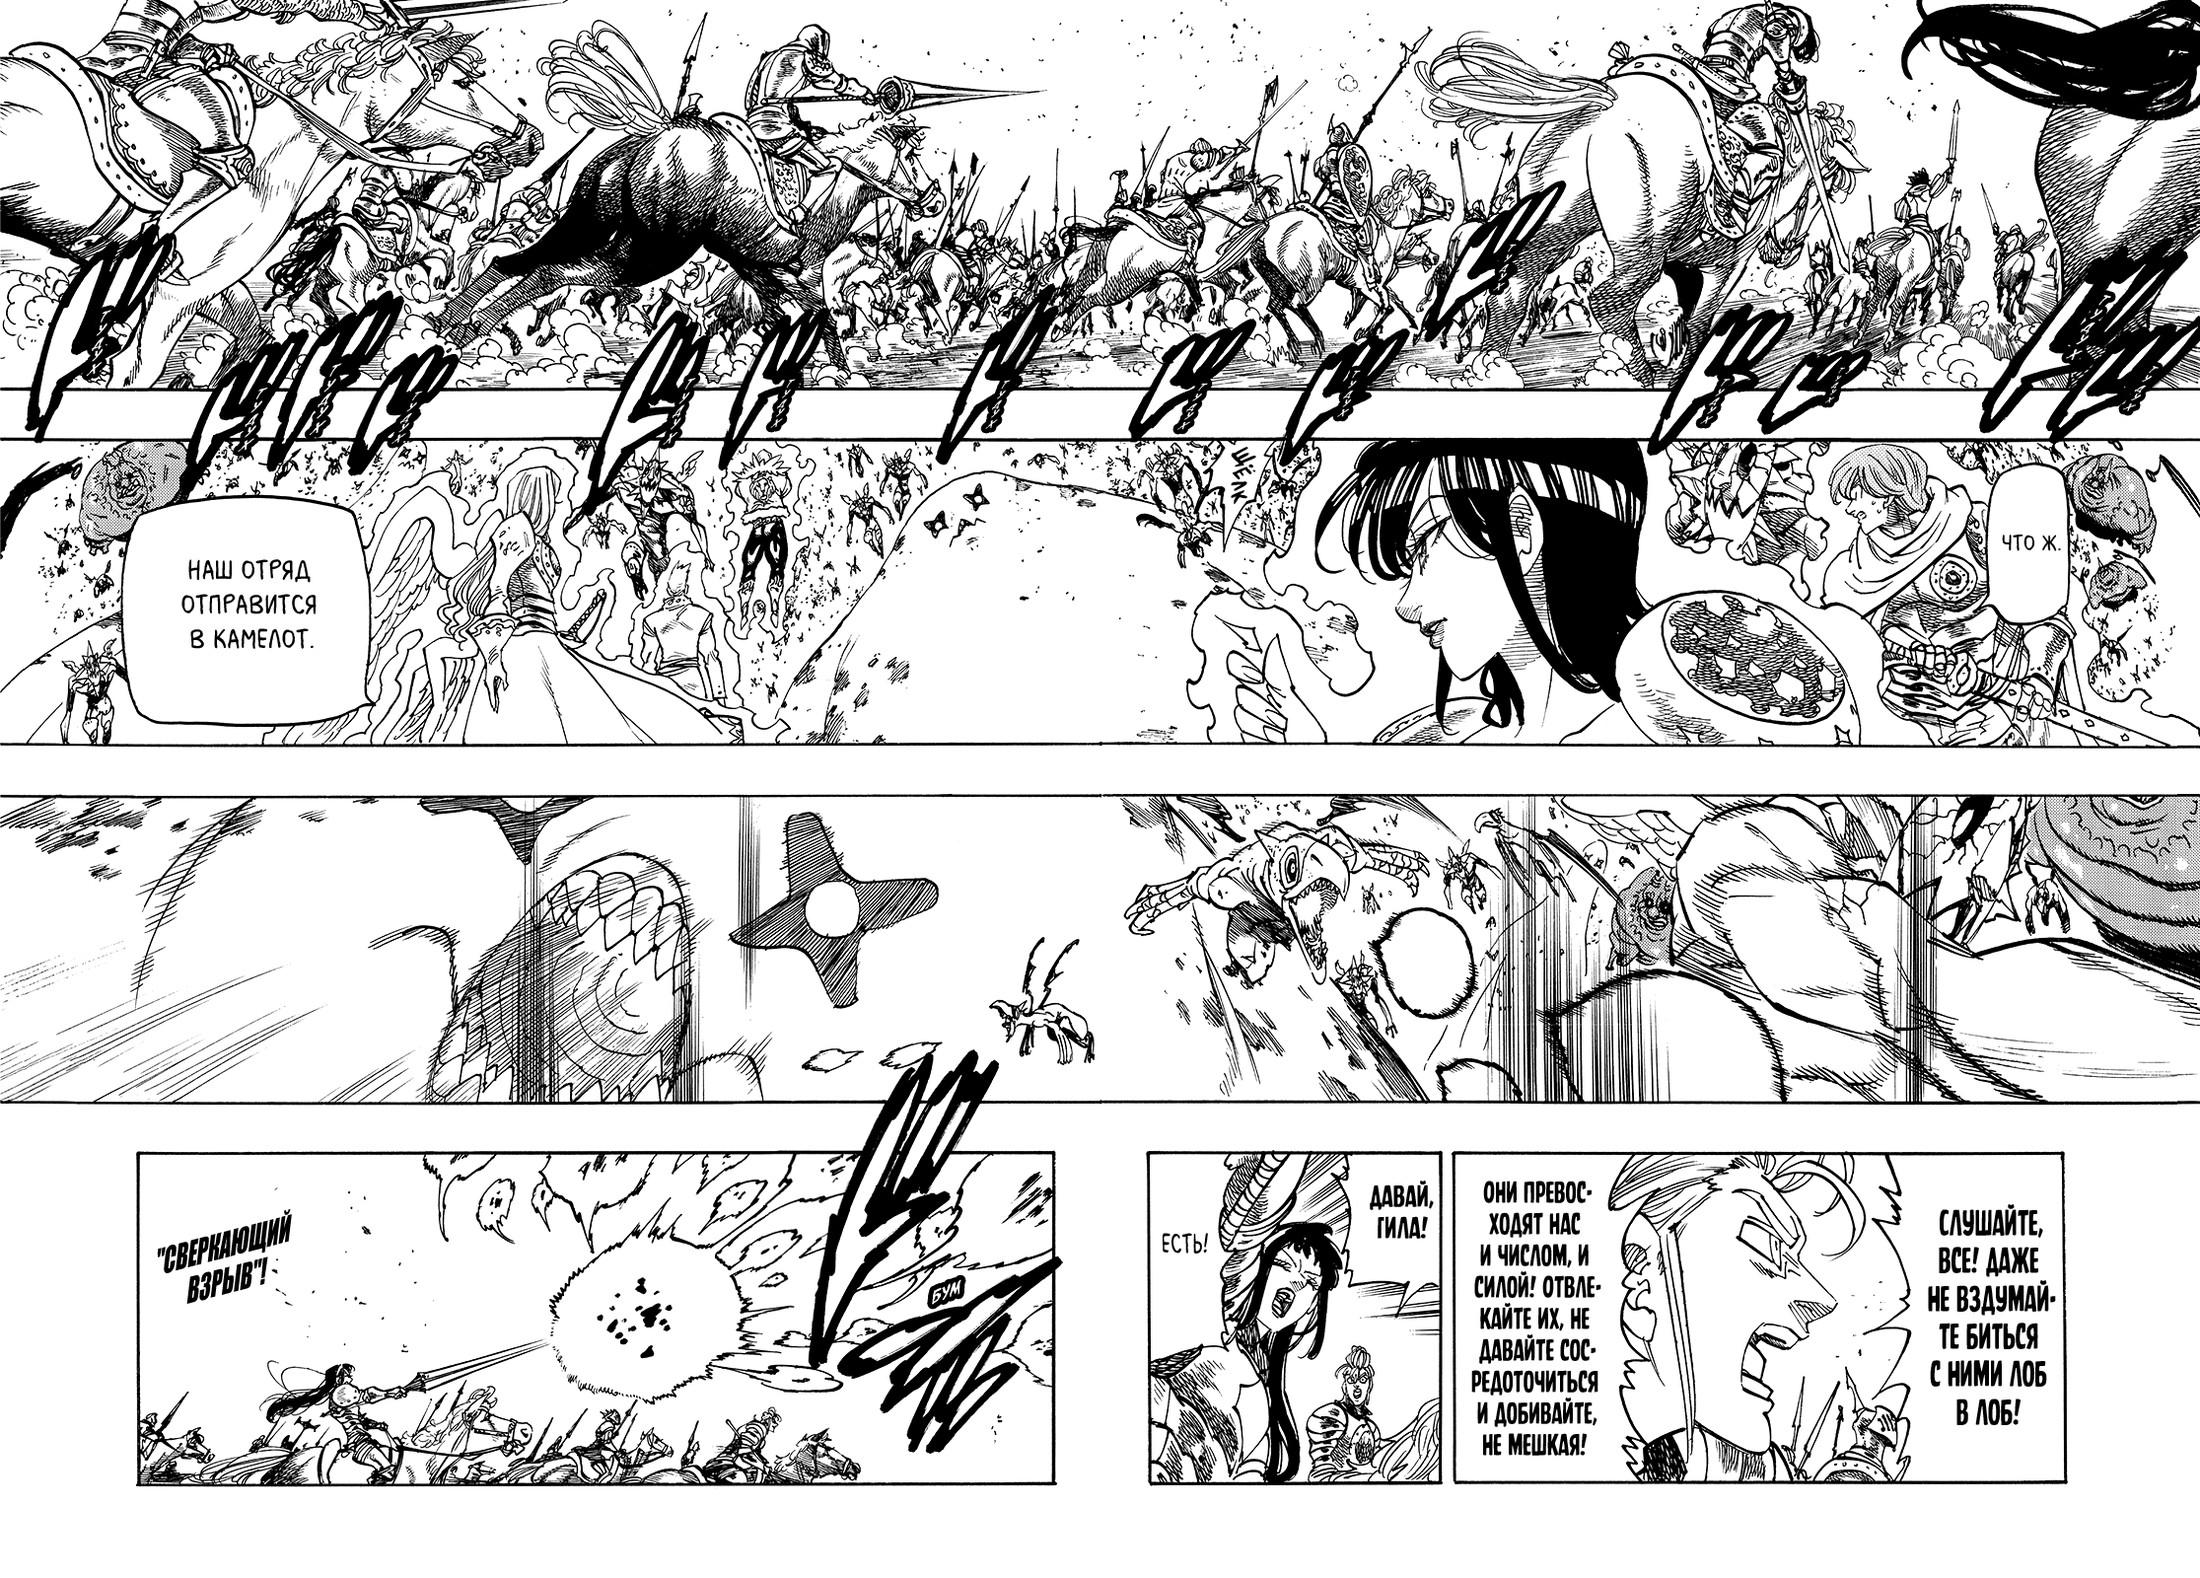 https://r1.ninemanga.com/comics/pic2/29/22109/419599/1534421176253.jpg Page 2